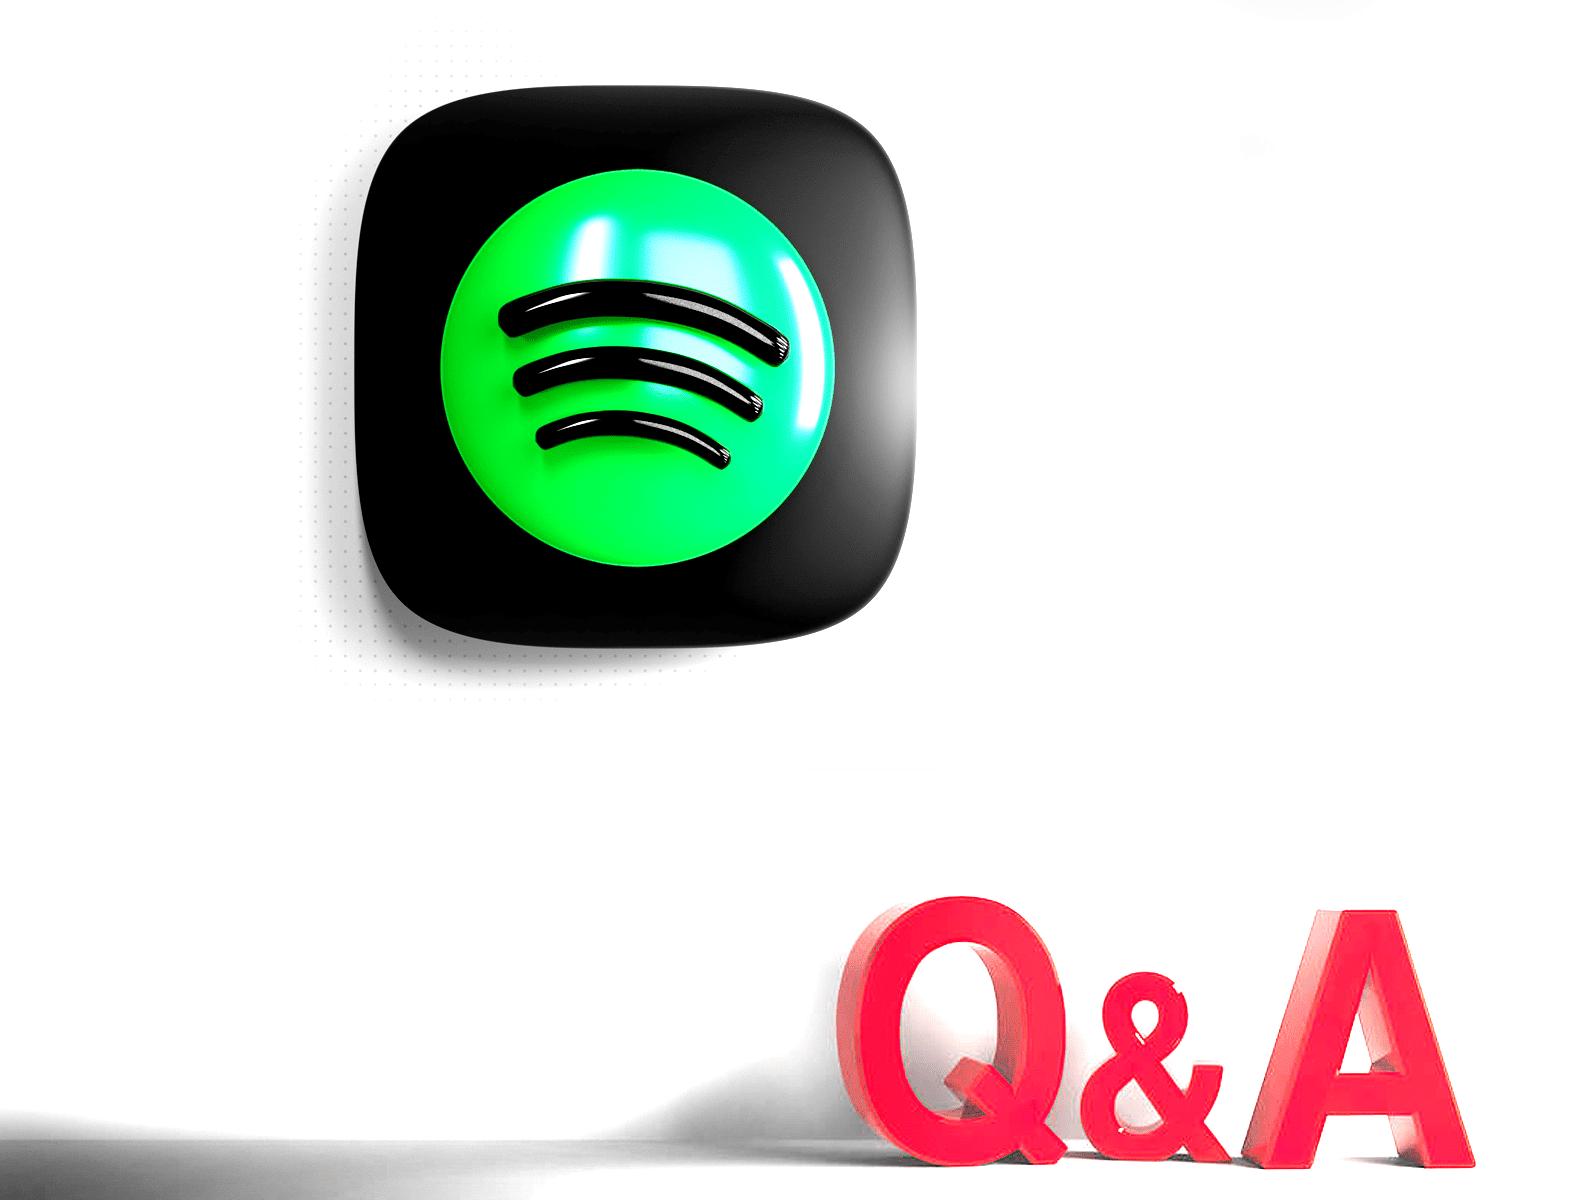 Spotify Q&A saiid zeidan